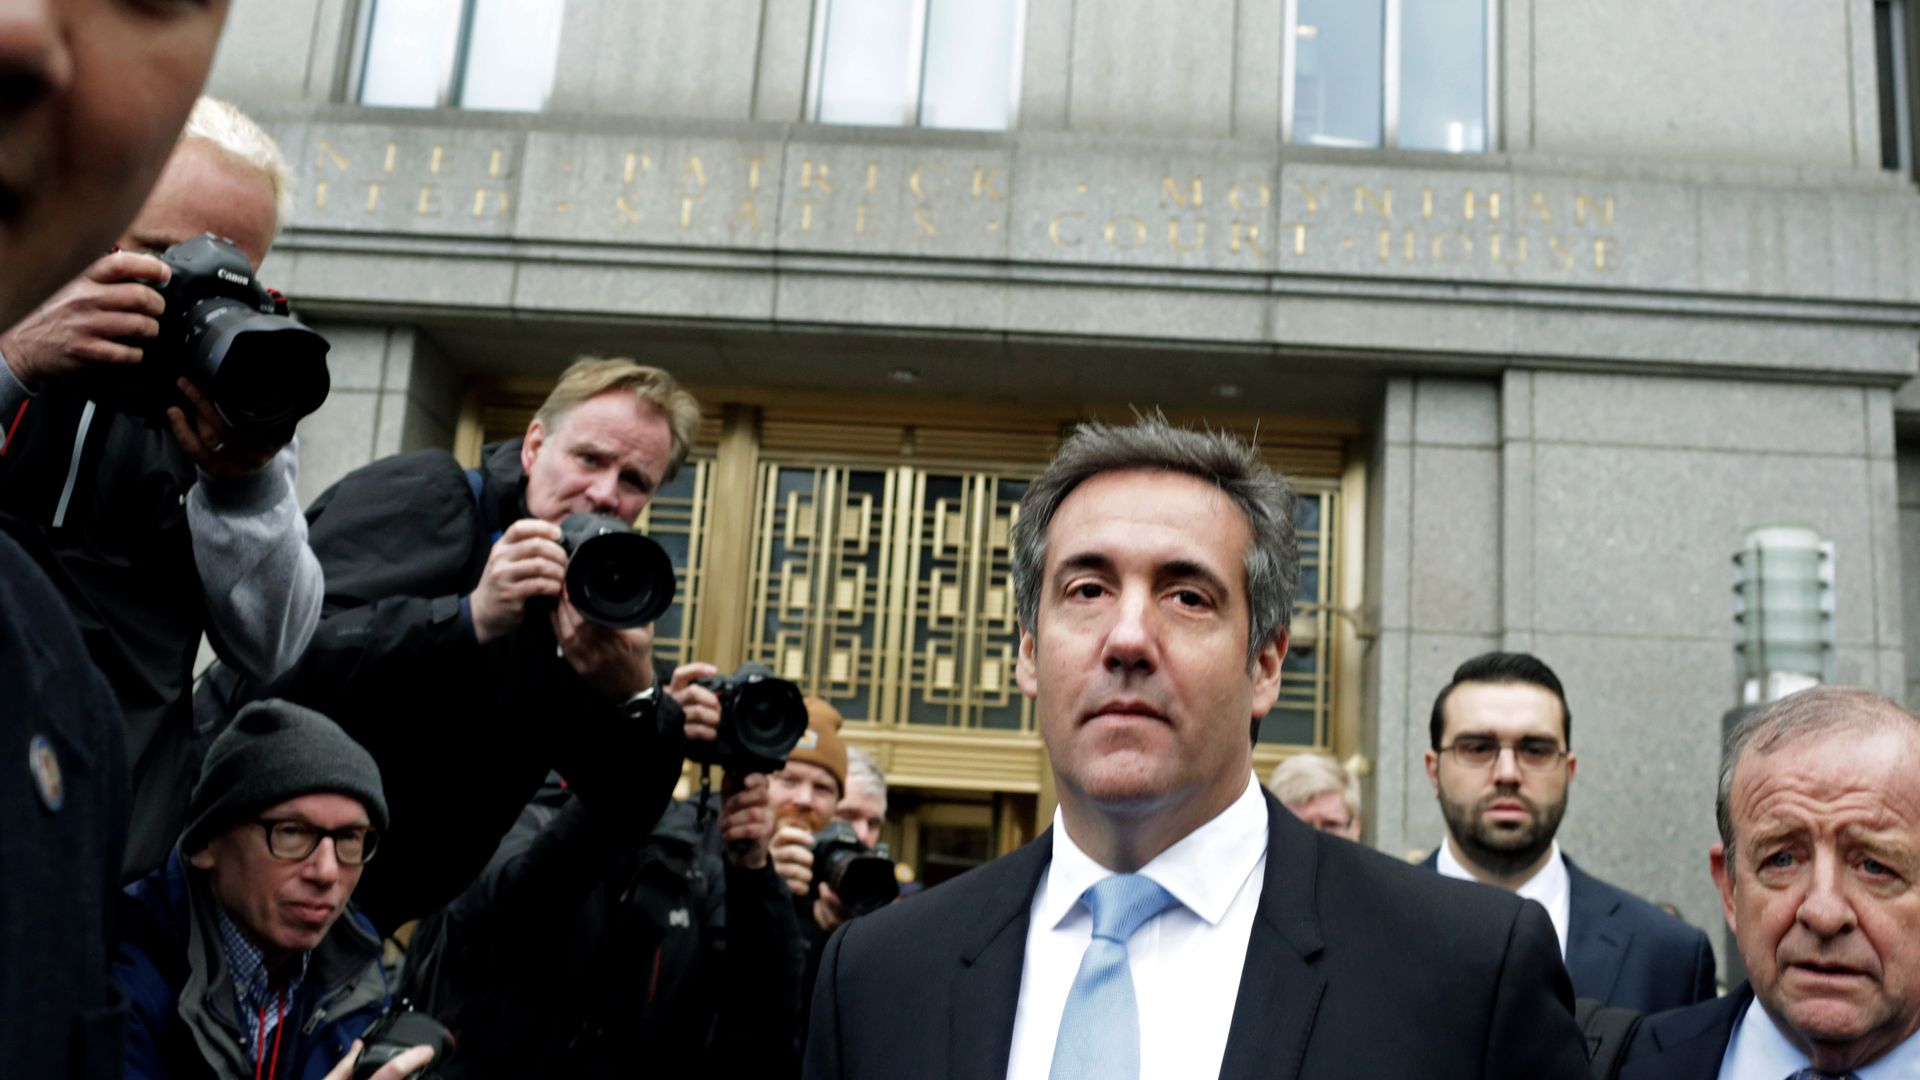 Michael Cohen walking next to photographers.